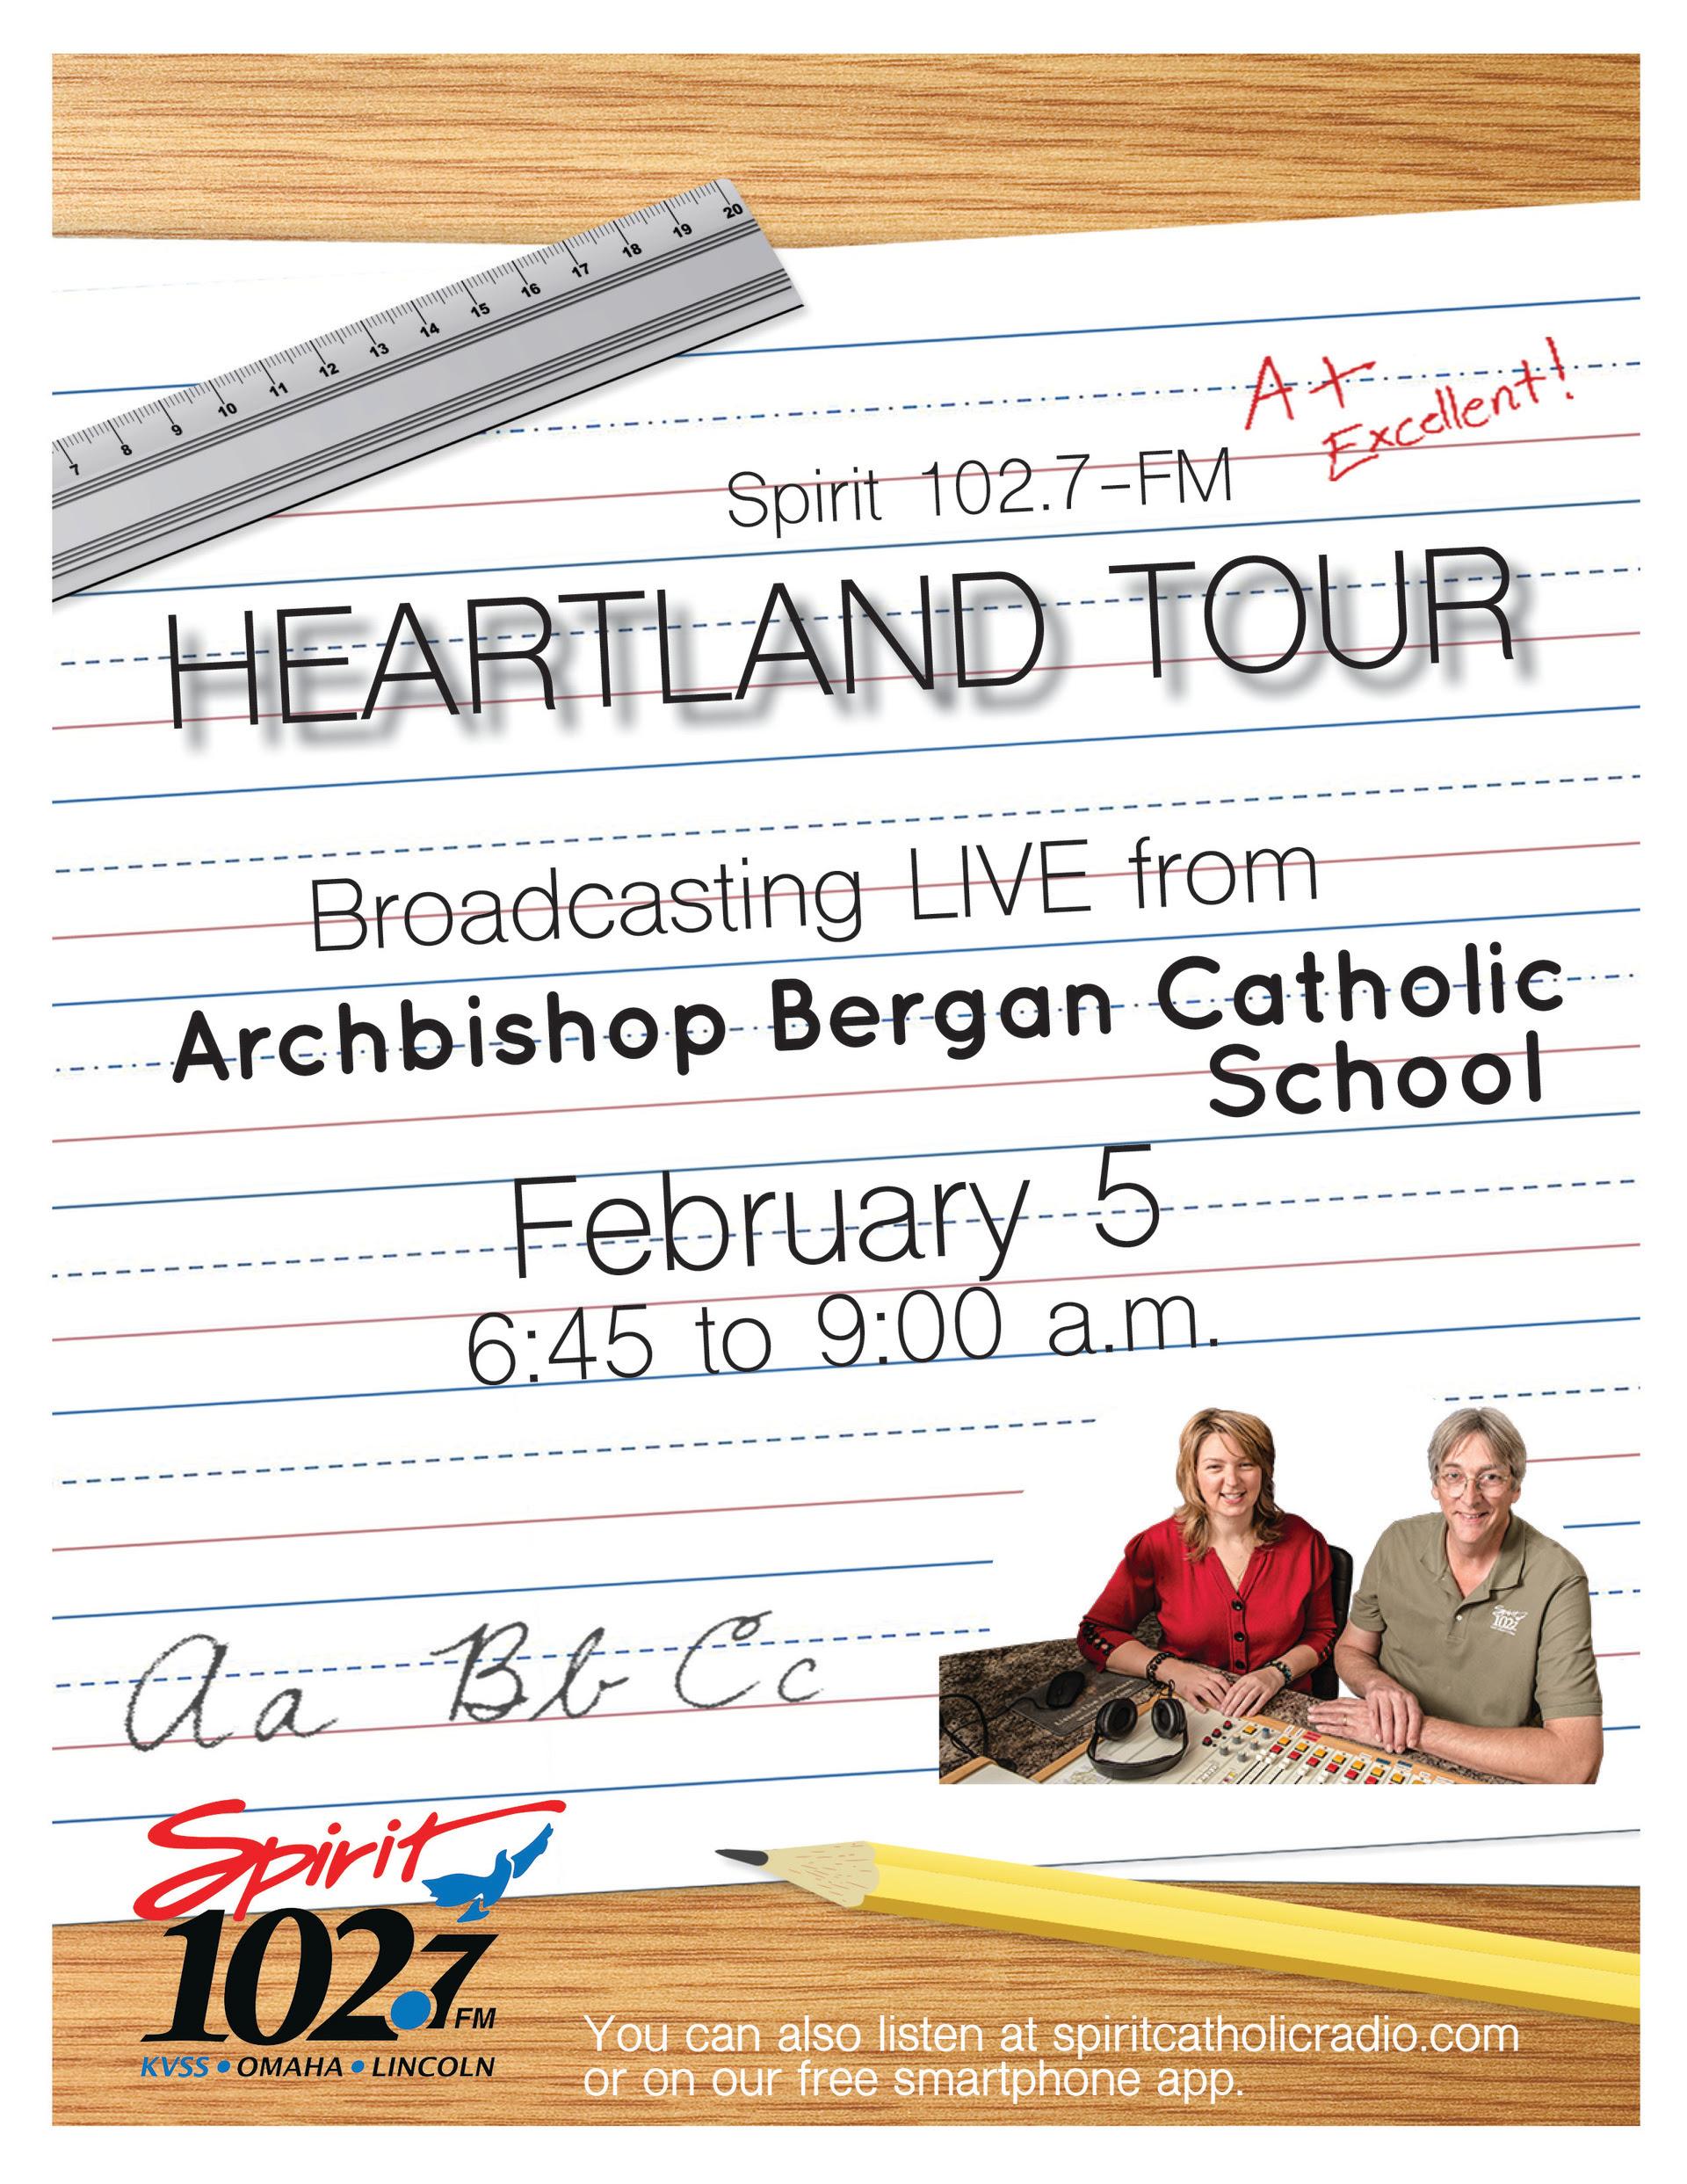 Spirit 102.7 - FM Heartland Tour